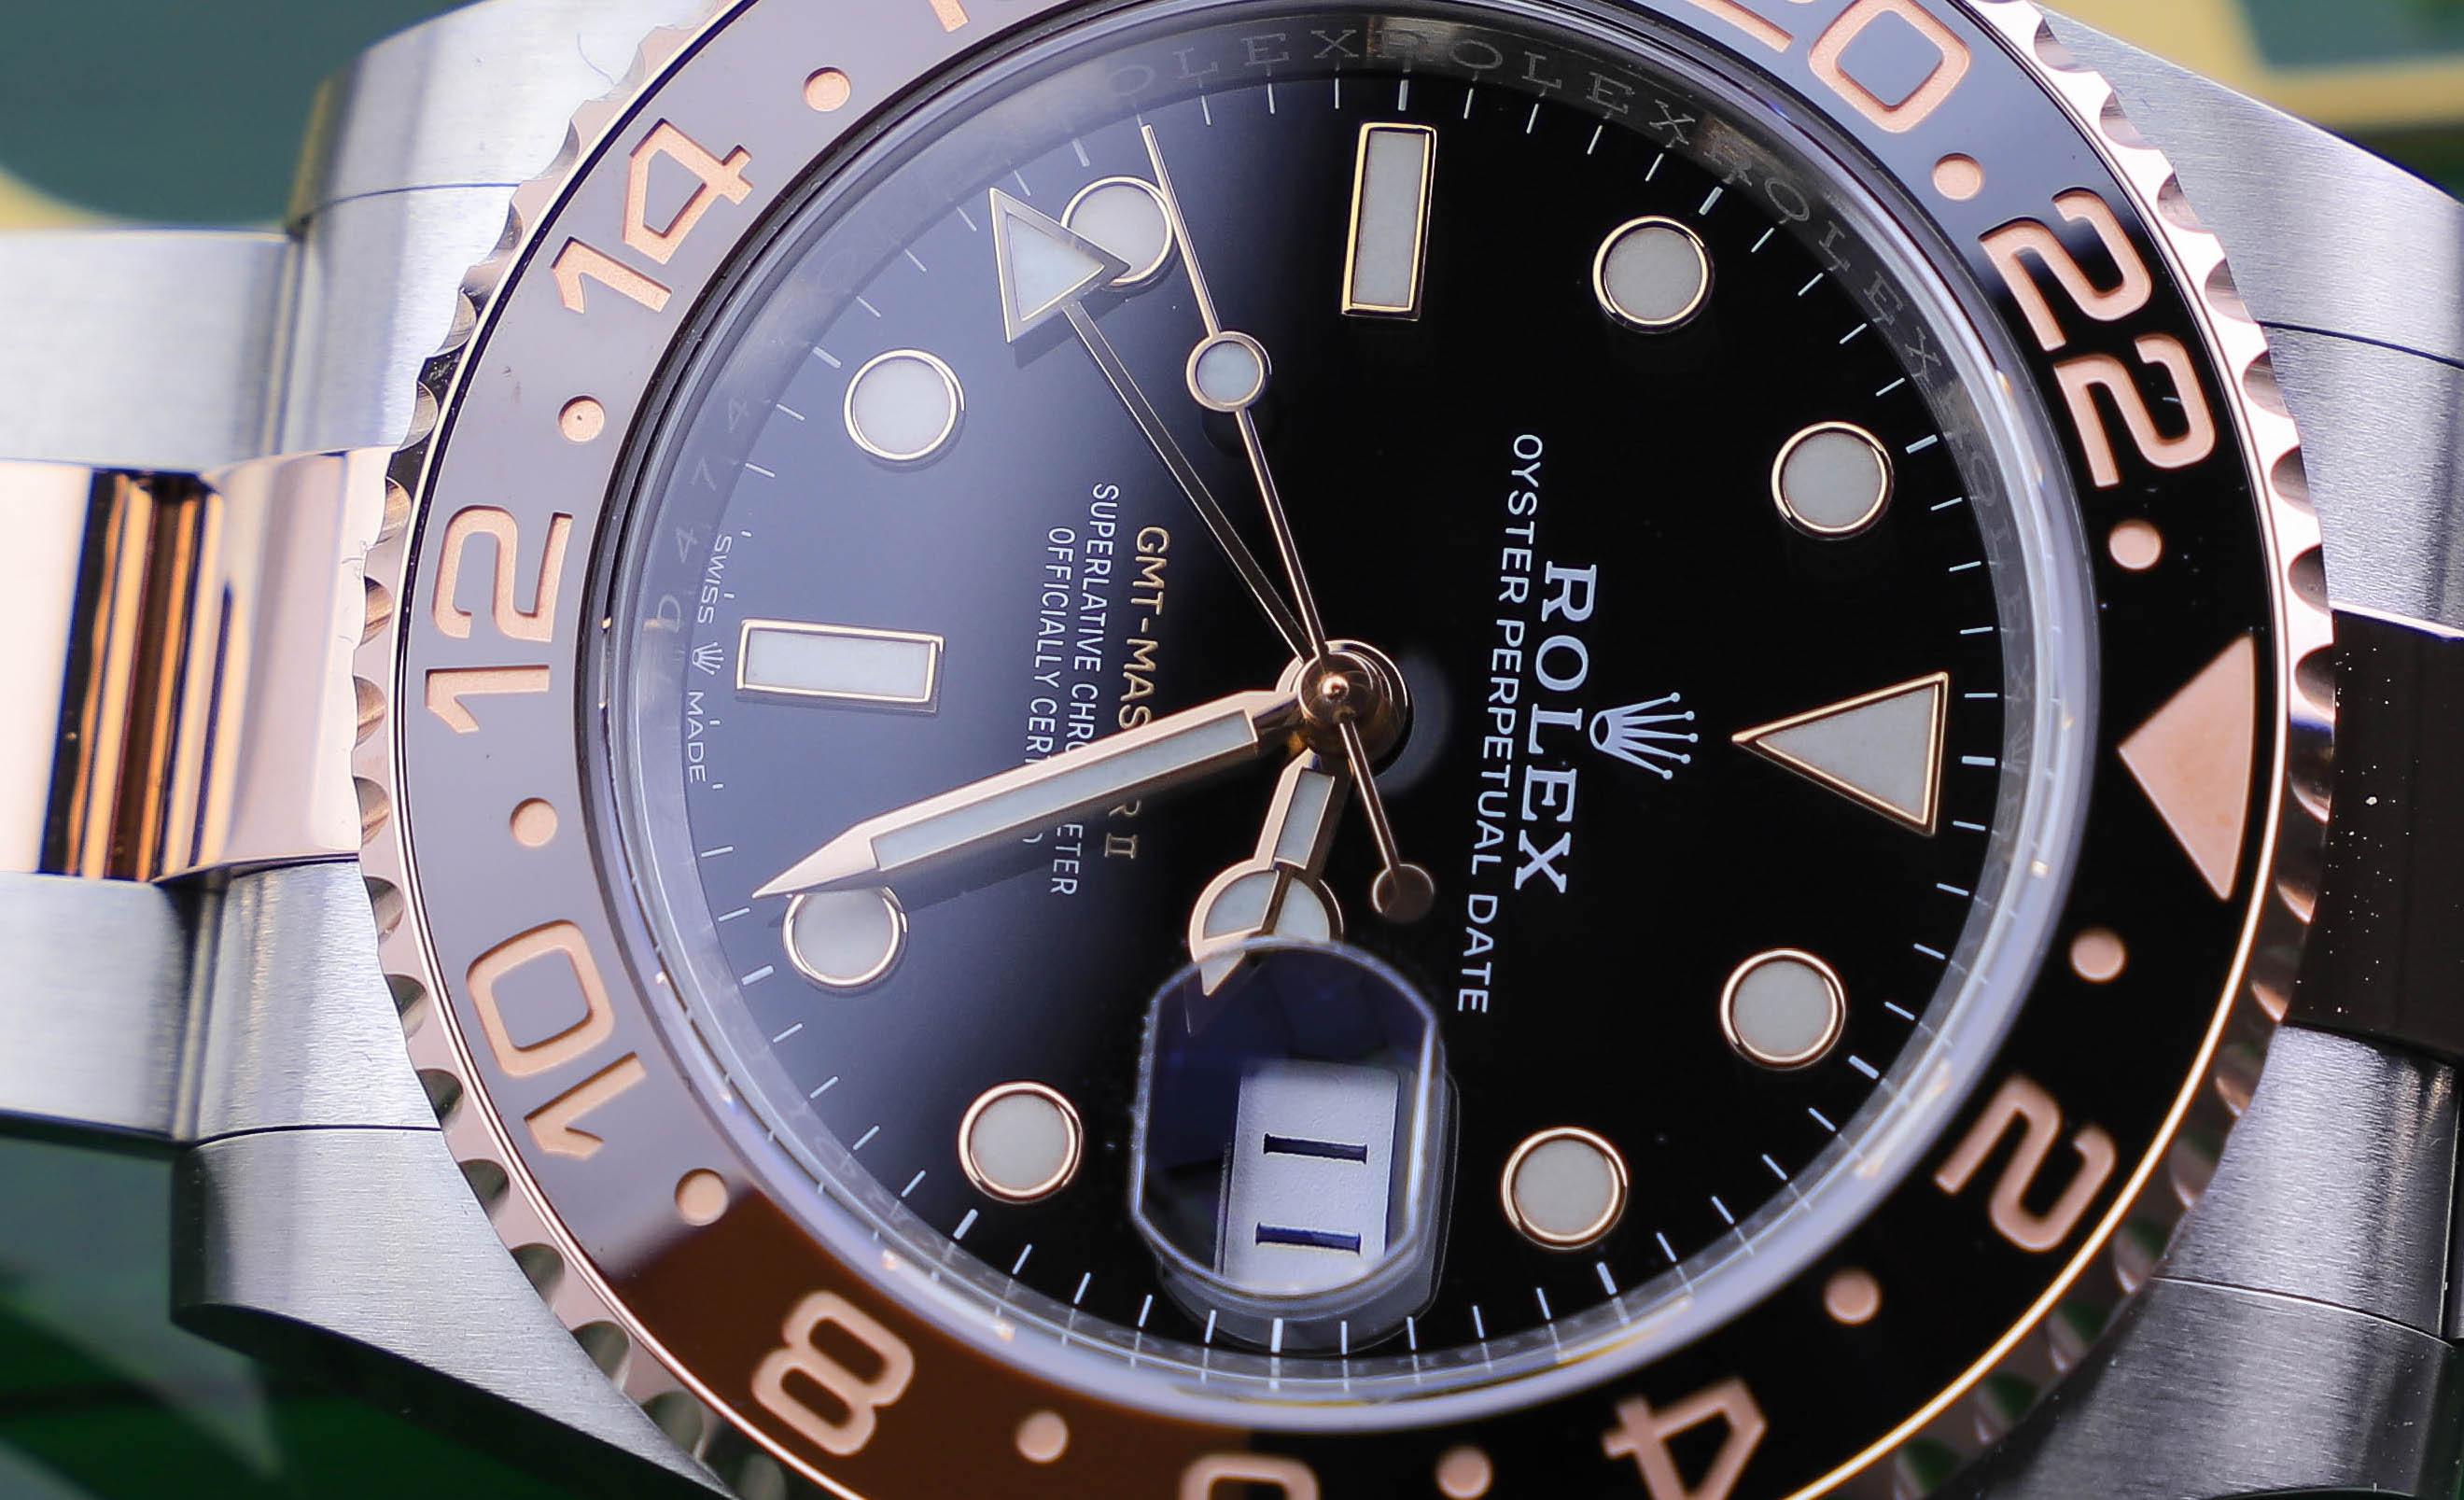 How to spot a fake Rolex